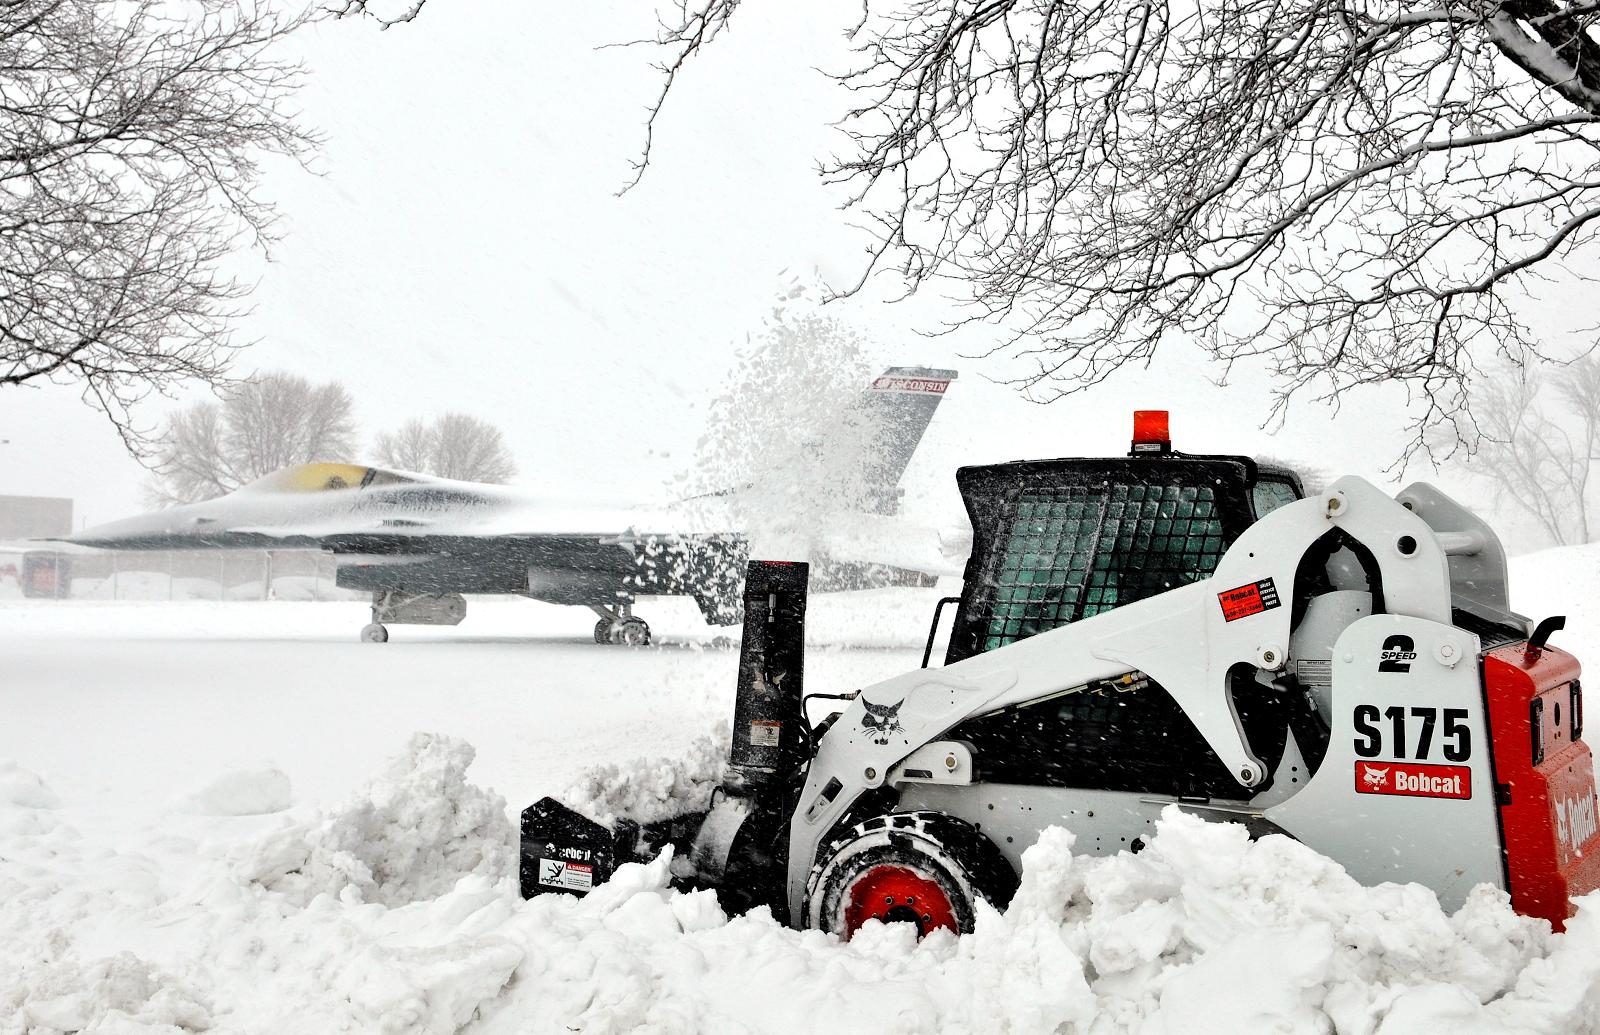 Bobcat Snow Removal Attachment Parts - Heavy Duty Direct | Bobcat